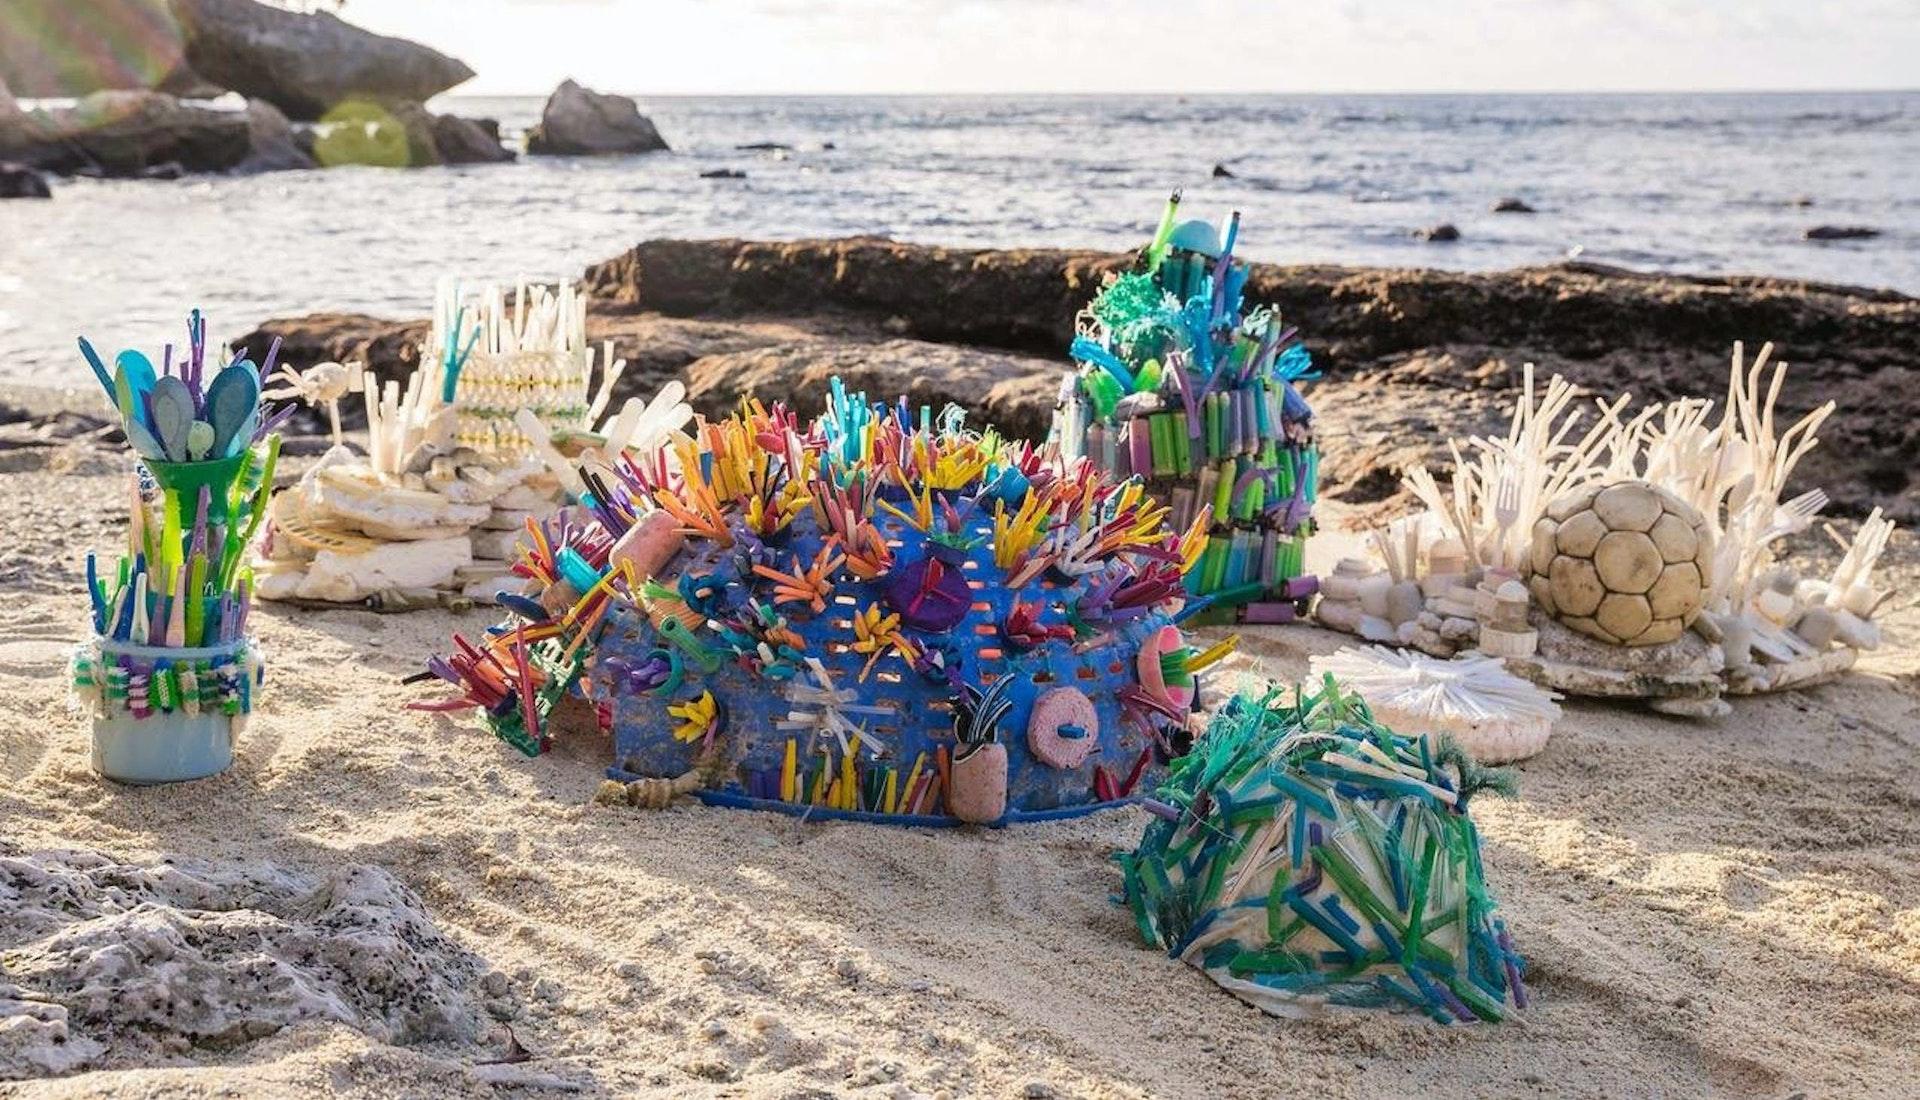 Sea Week 2019 - Event - Tourism Western Australia